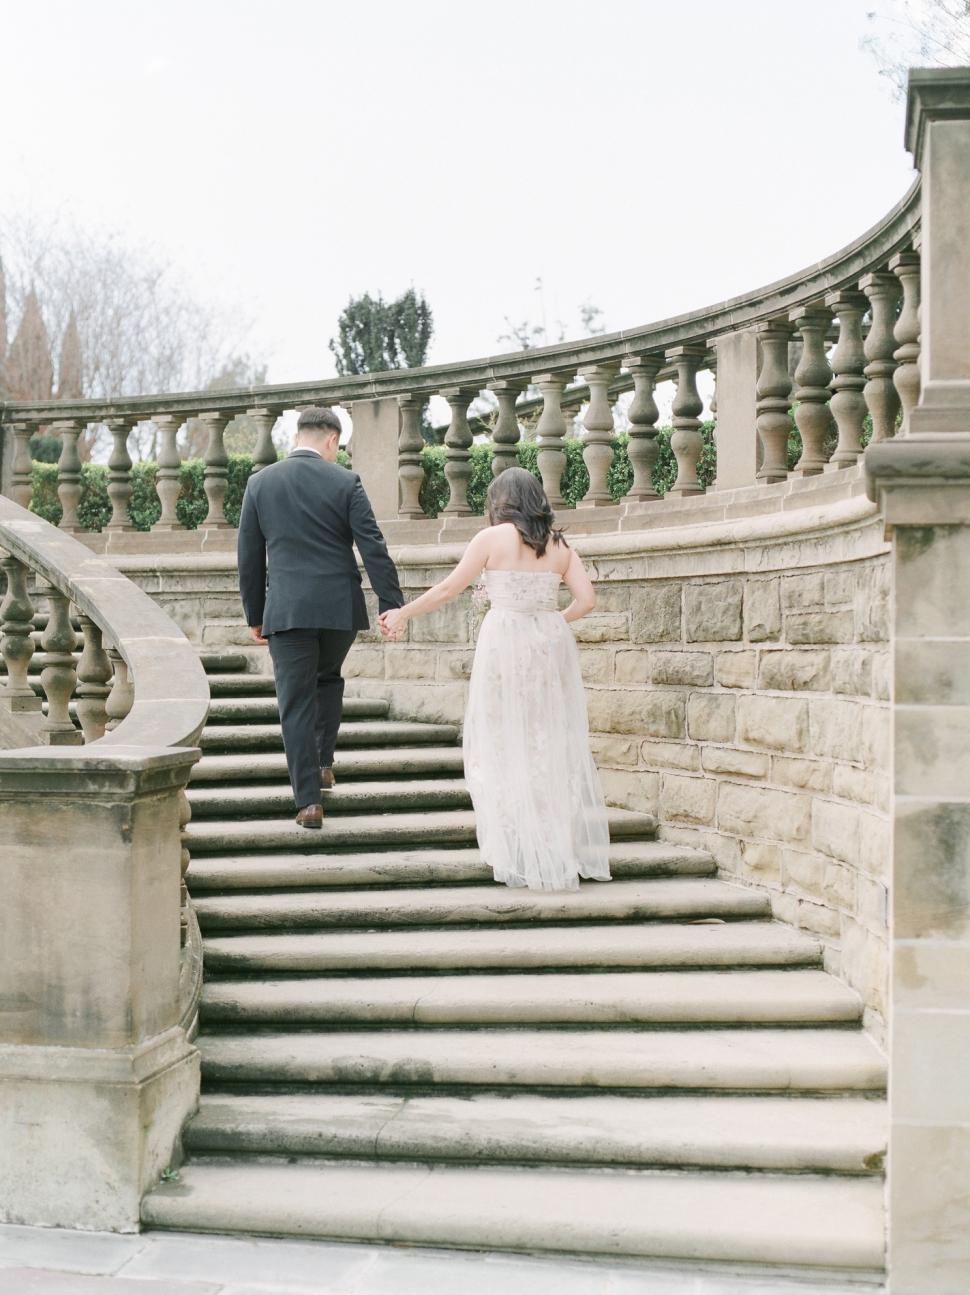 Southern-California-Wedding-Photographer-Cassi-Claire-Greystone-Mansion-Beverly-Hills-CA-wedding_21.jpg